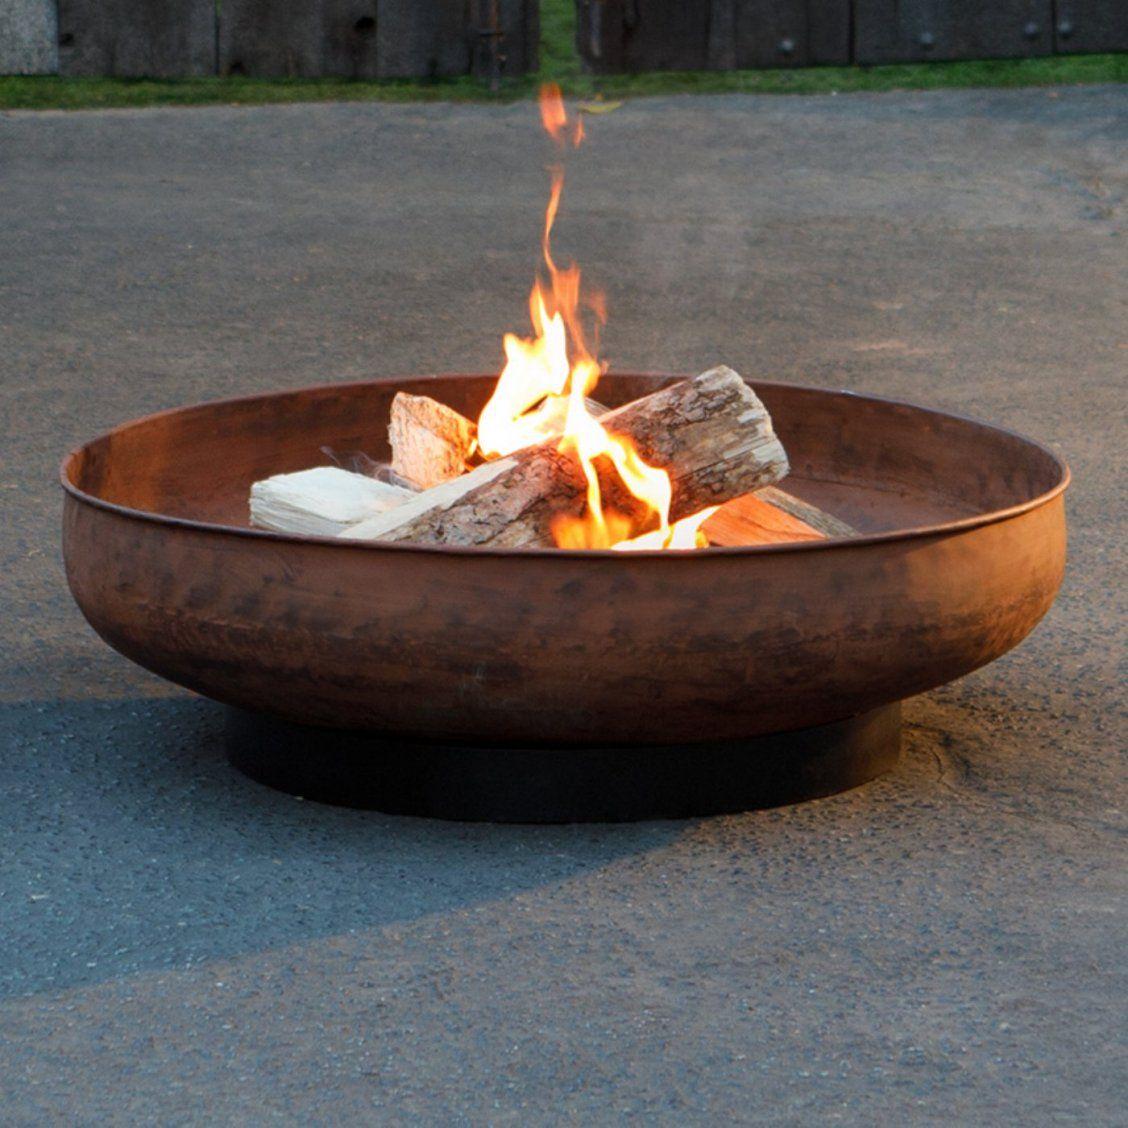 Coral Coast Sechee Large Round Iron Wood Burning Fire Pit Wood Burning Fire Pit Iron Fire Pit Cast Iron Fire Pit